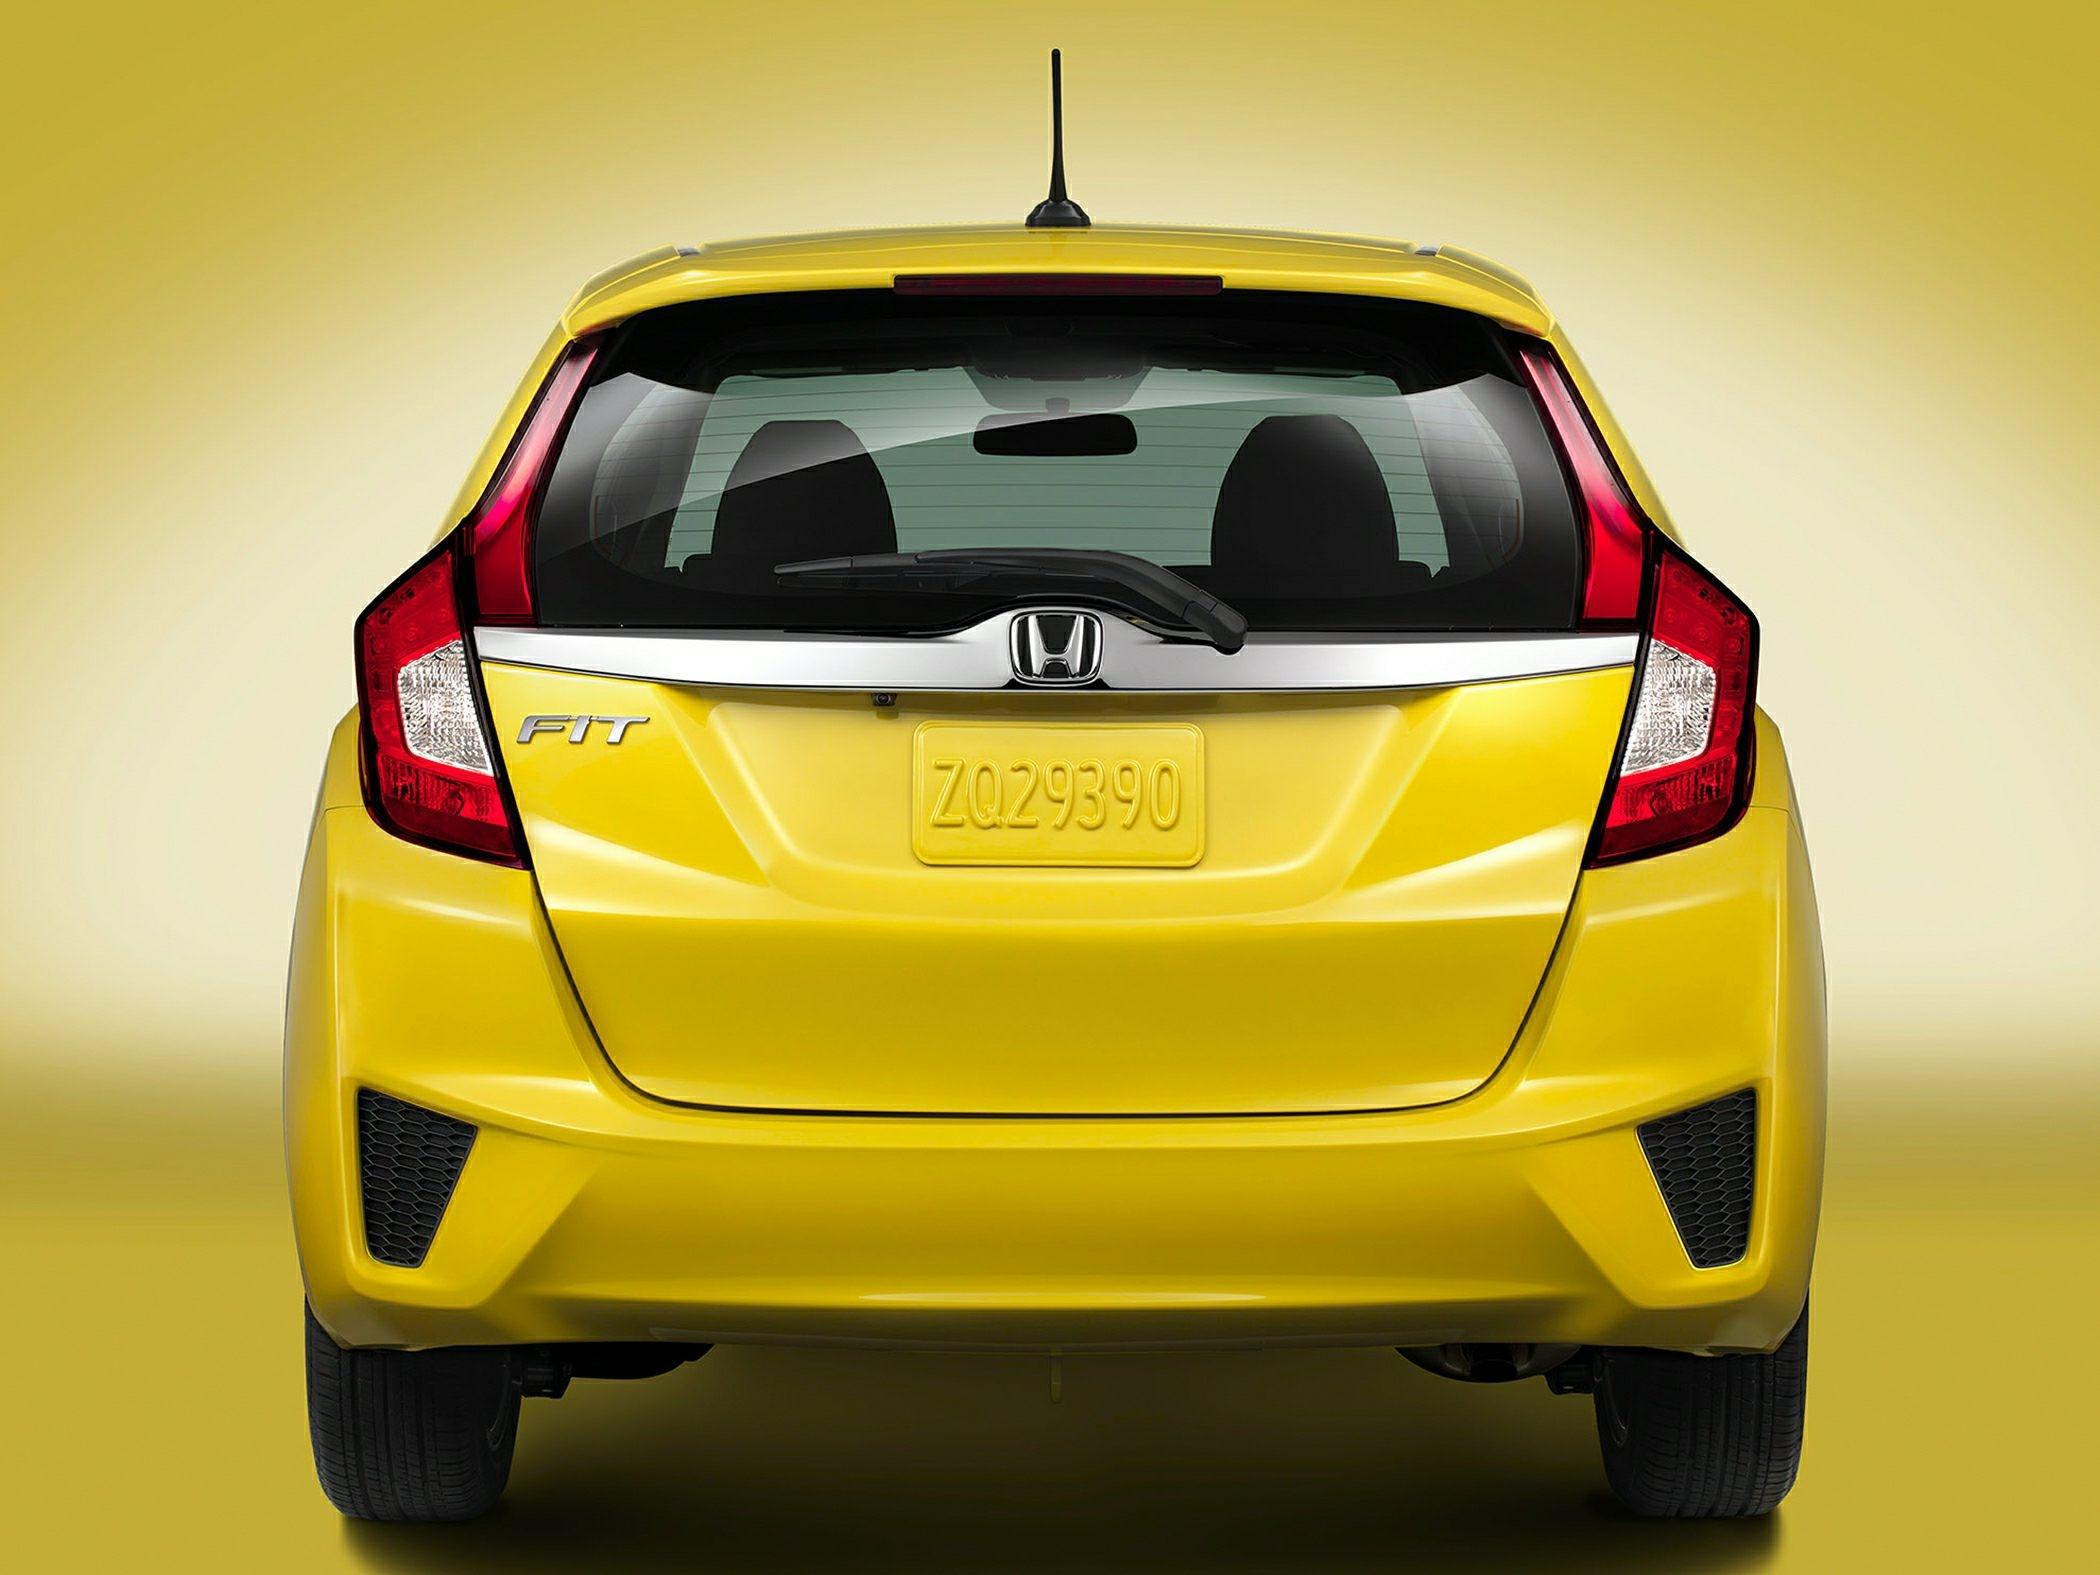 honda fit invoice price 2015 honda fit price photos reviews amp features 2100 X 1575